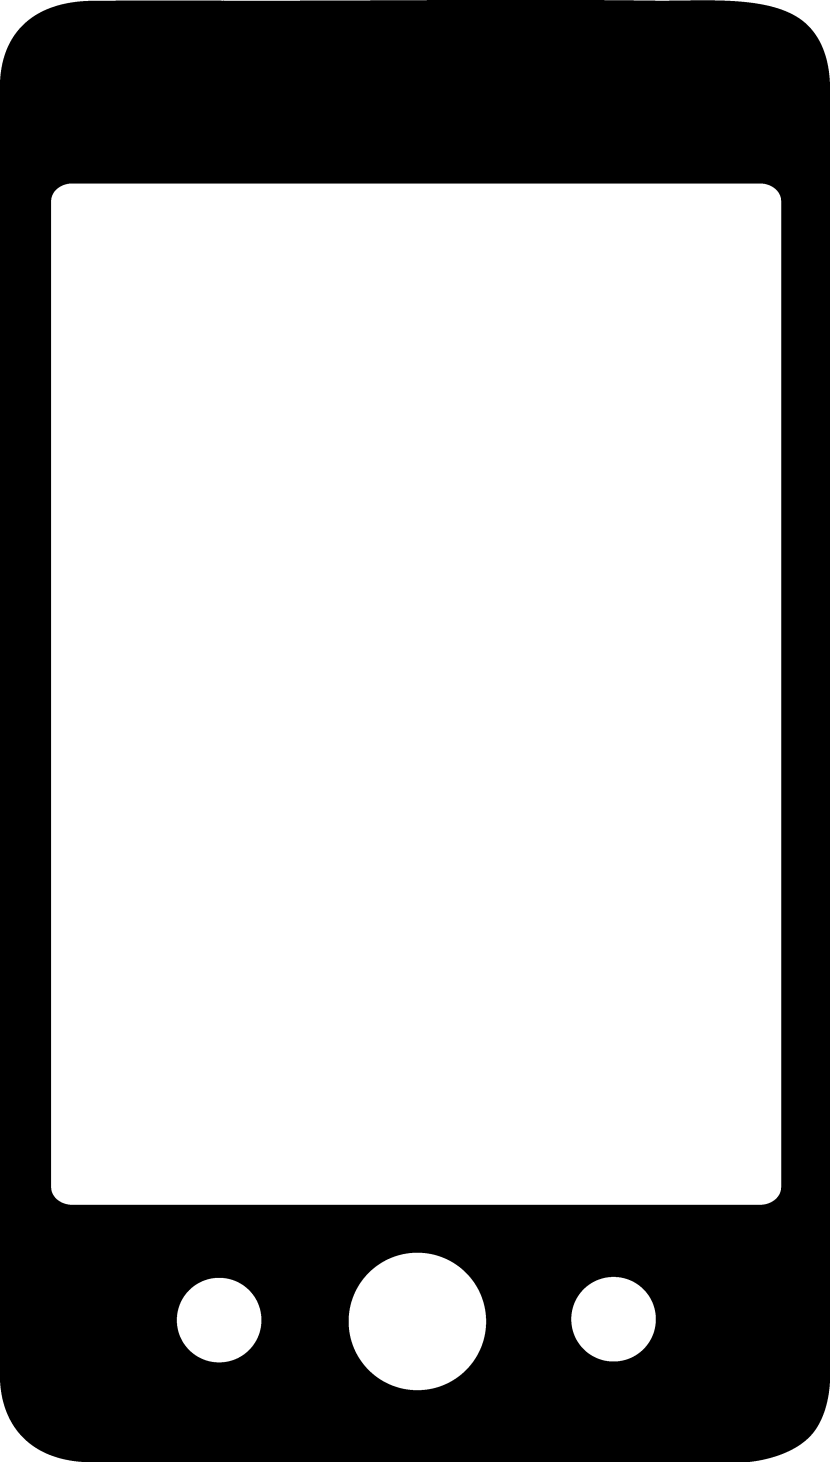 Phone pic clipart clip art Free Phone Cliparts, Download Free Clip Art, Free Clip Art ... clip art